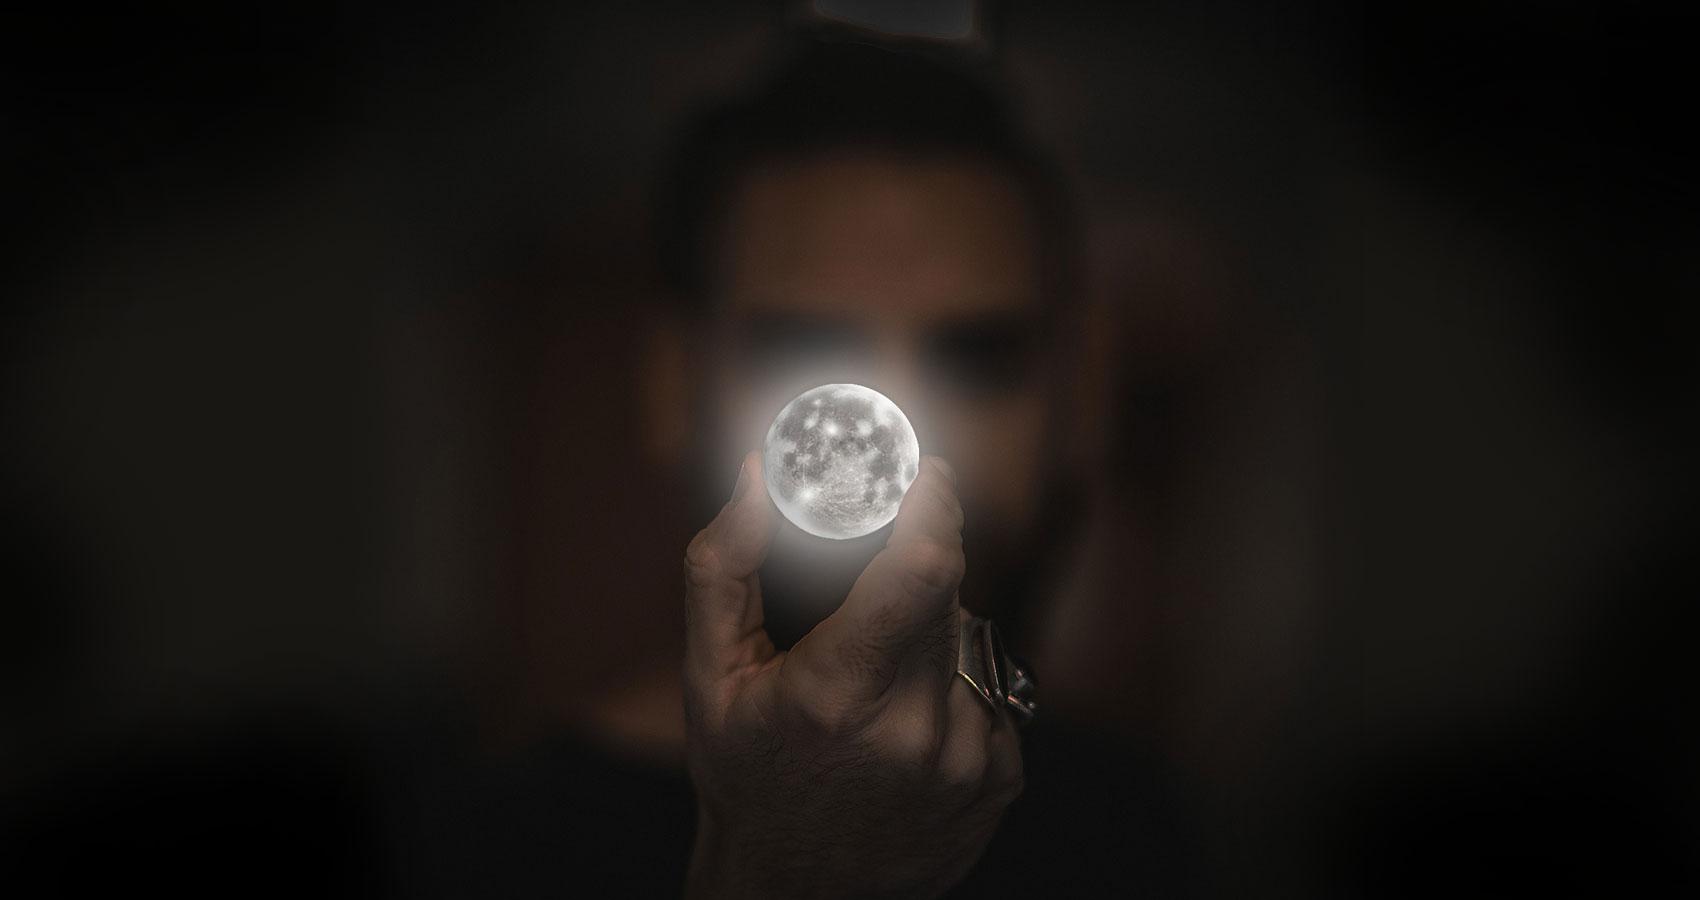 Full Moon Again written by Ipsita Banerjee at Spillwords.com